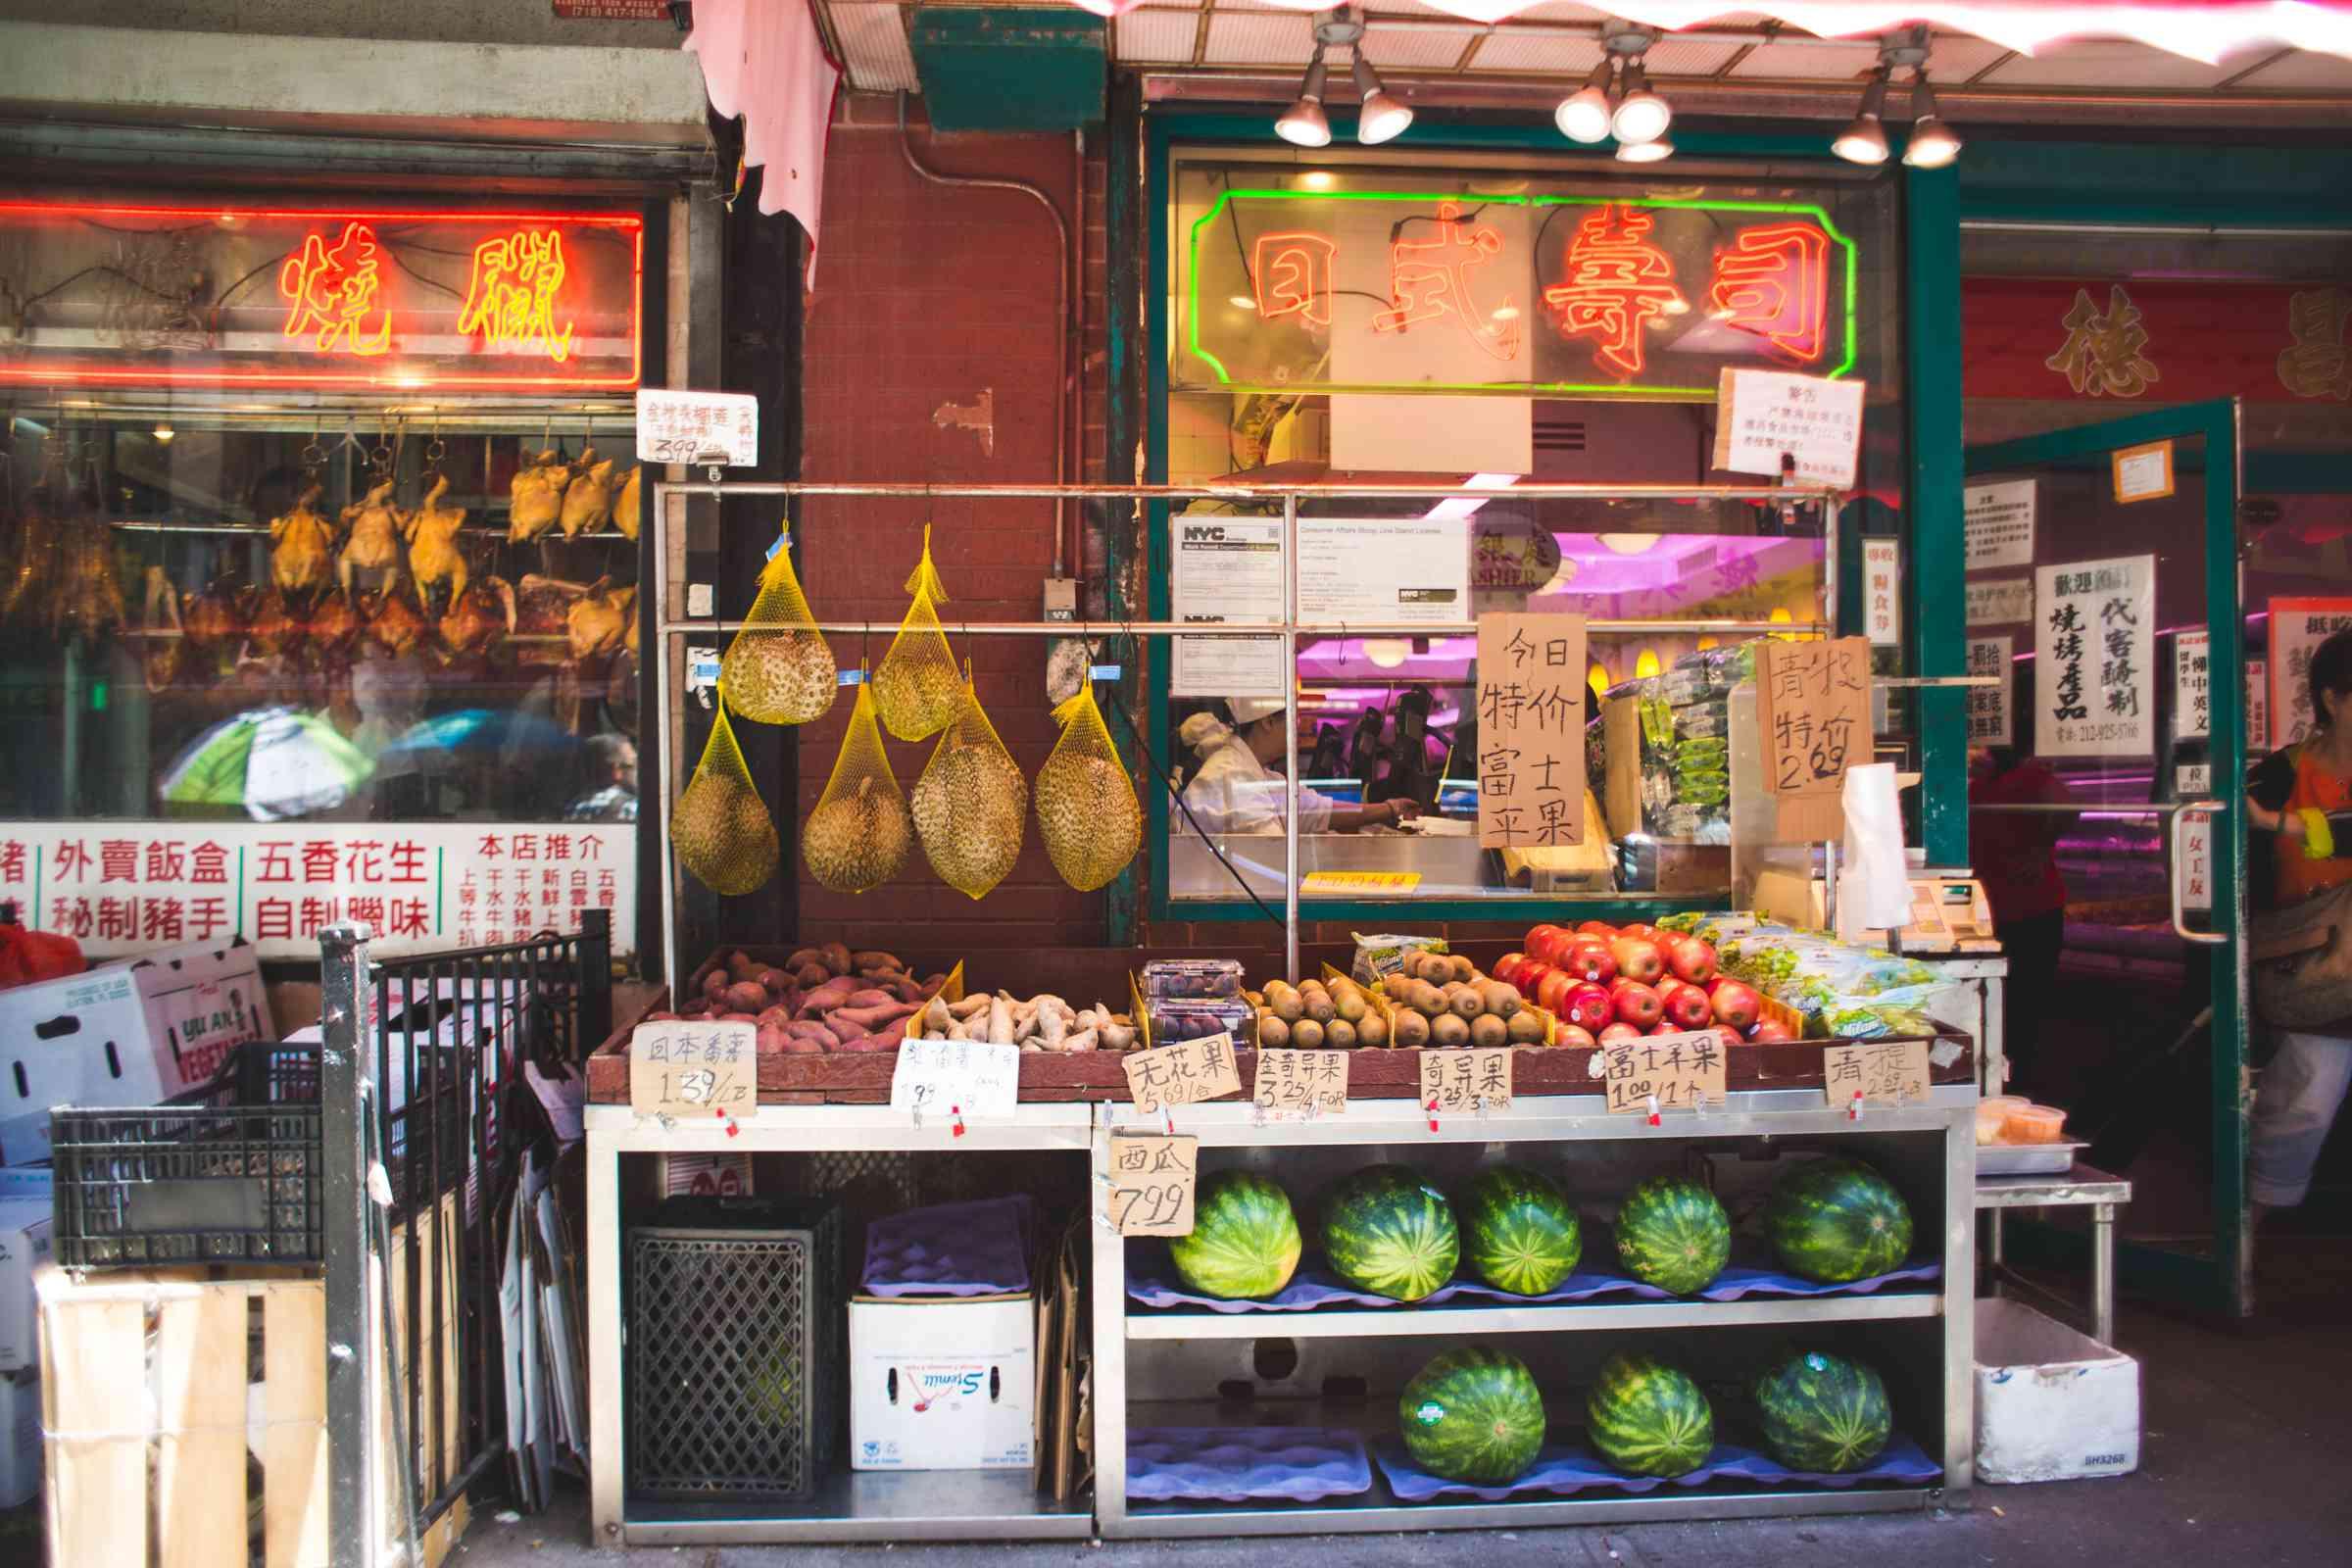 Manhattan's Chinatown in New York